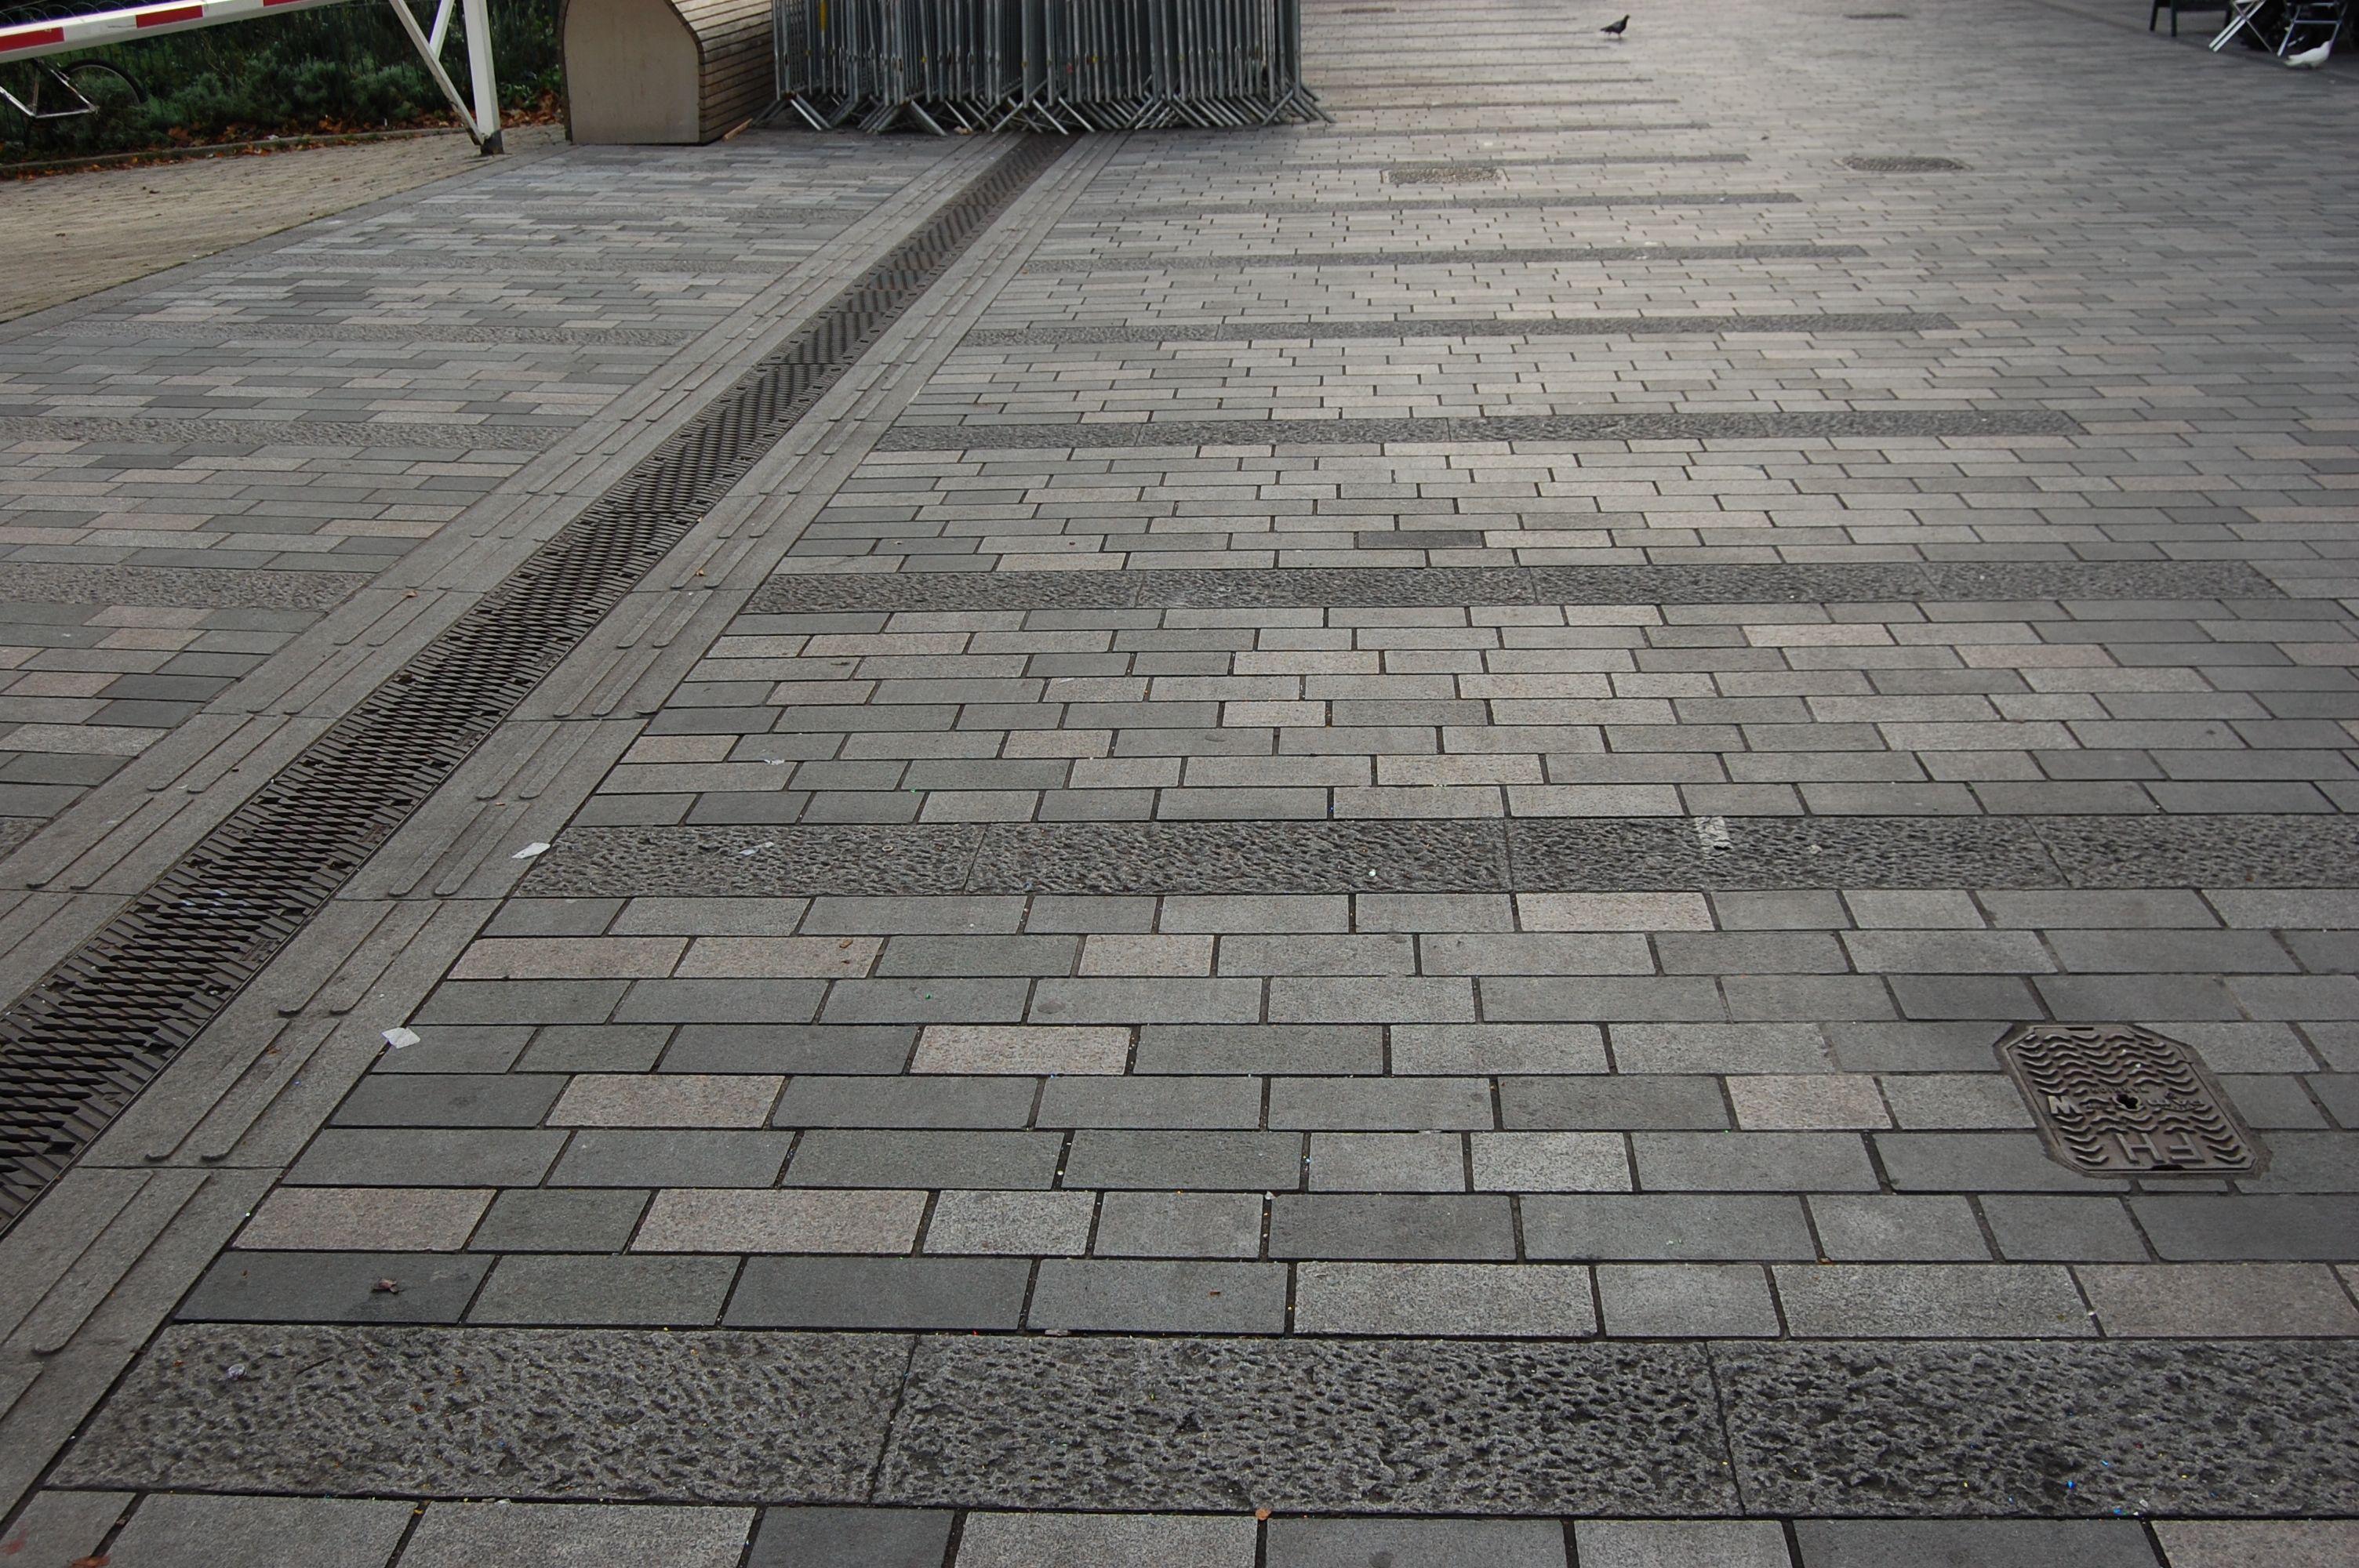 Vehicular paving google search fine paving pinterest for Paving planner